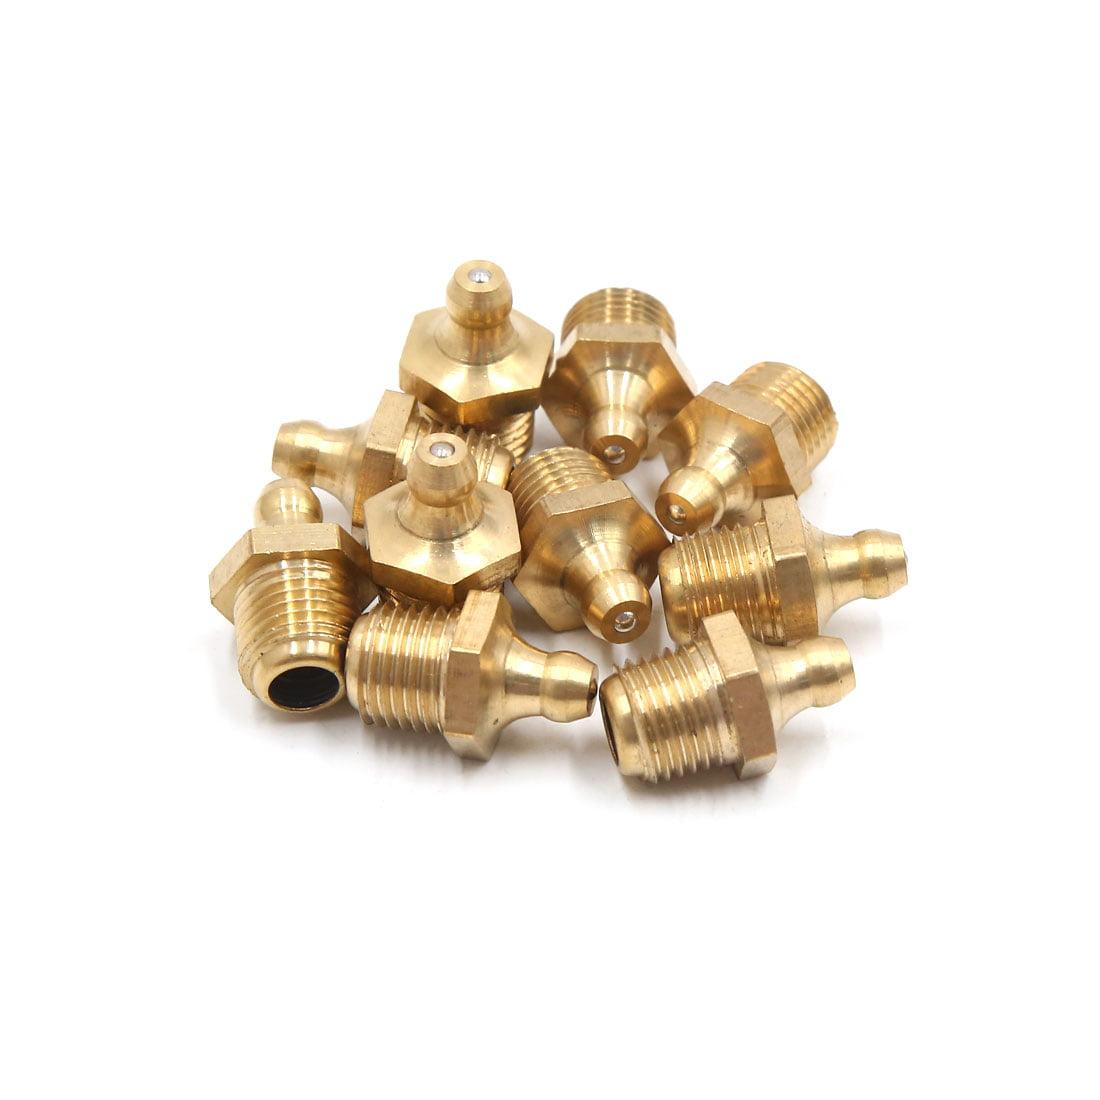 10Pcs M12 x 1.25 Thread Brass Straight Car Grease Zerk Nipple Fitting